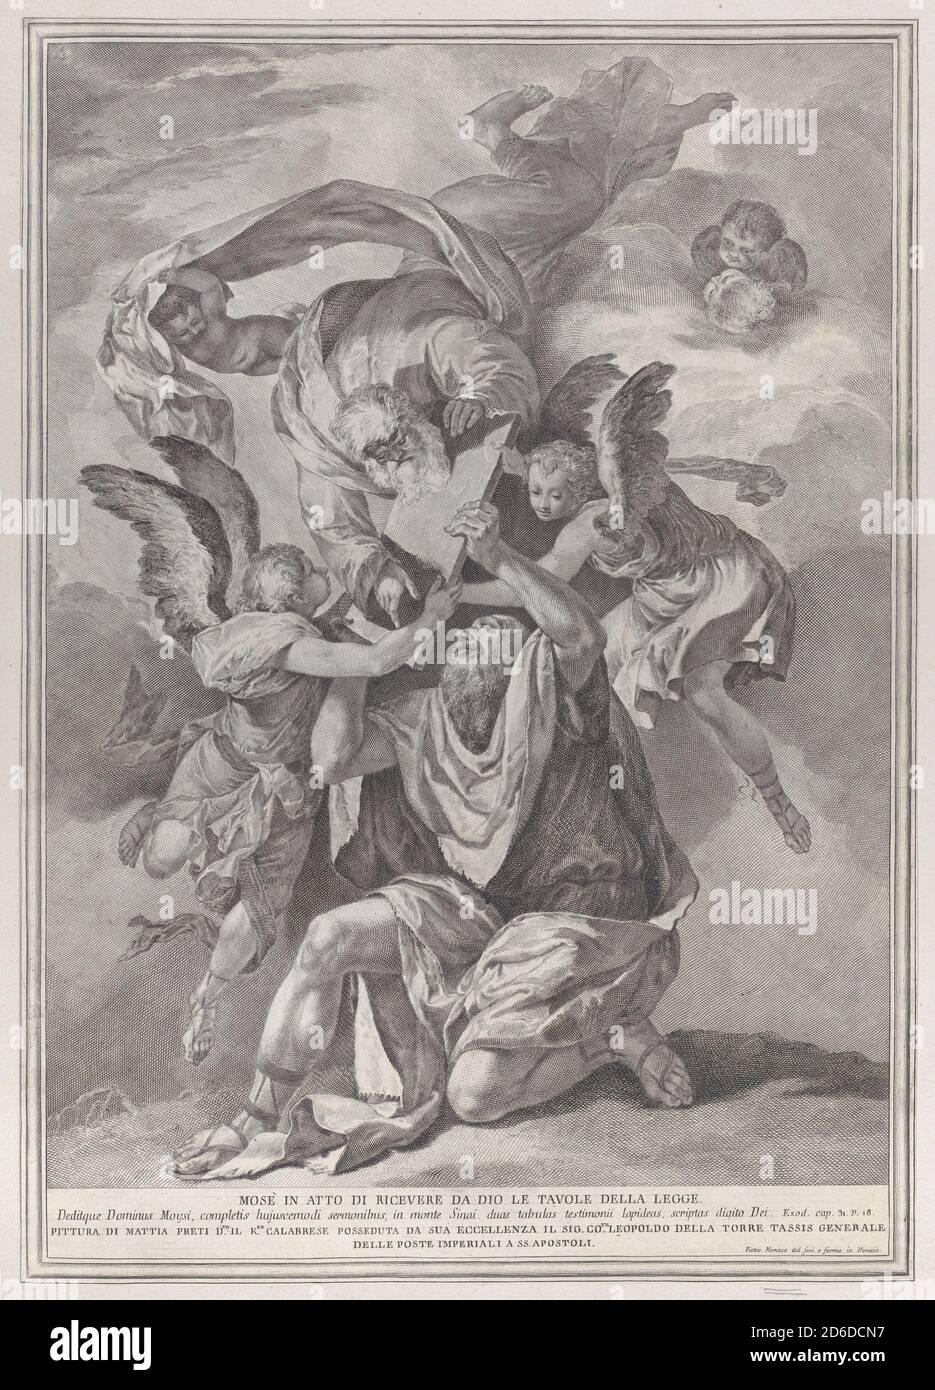 Moïse recevant les tablettes de la Loi de Dieu qui descend des cieux; de la série de 112 reproductions de l'histoire sacrée, après la peinture de Mattia Perti, ca. 1730-39. Banque D'Images